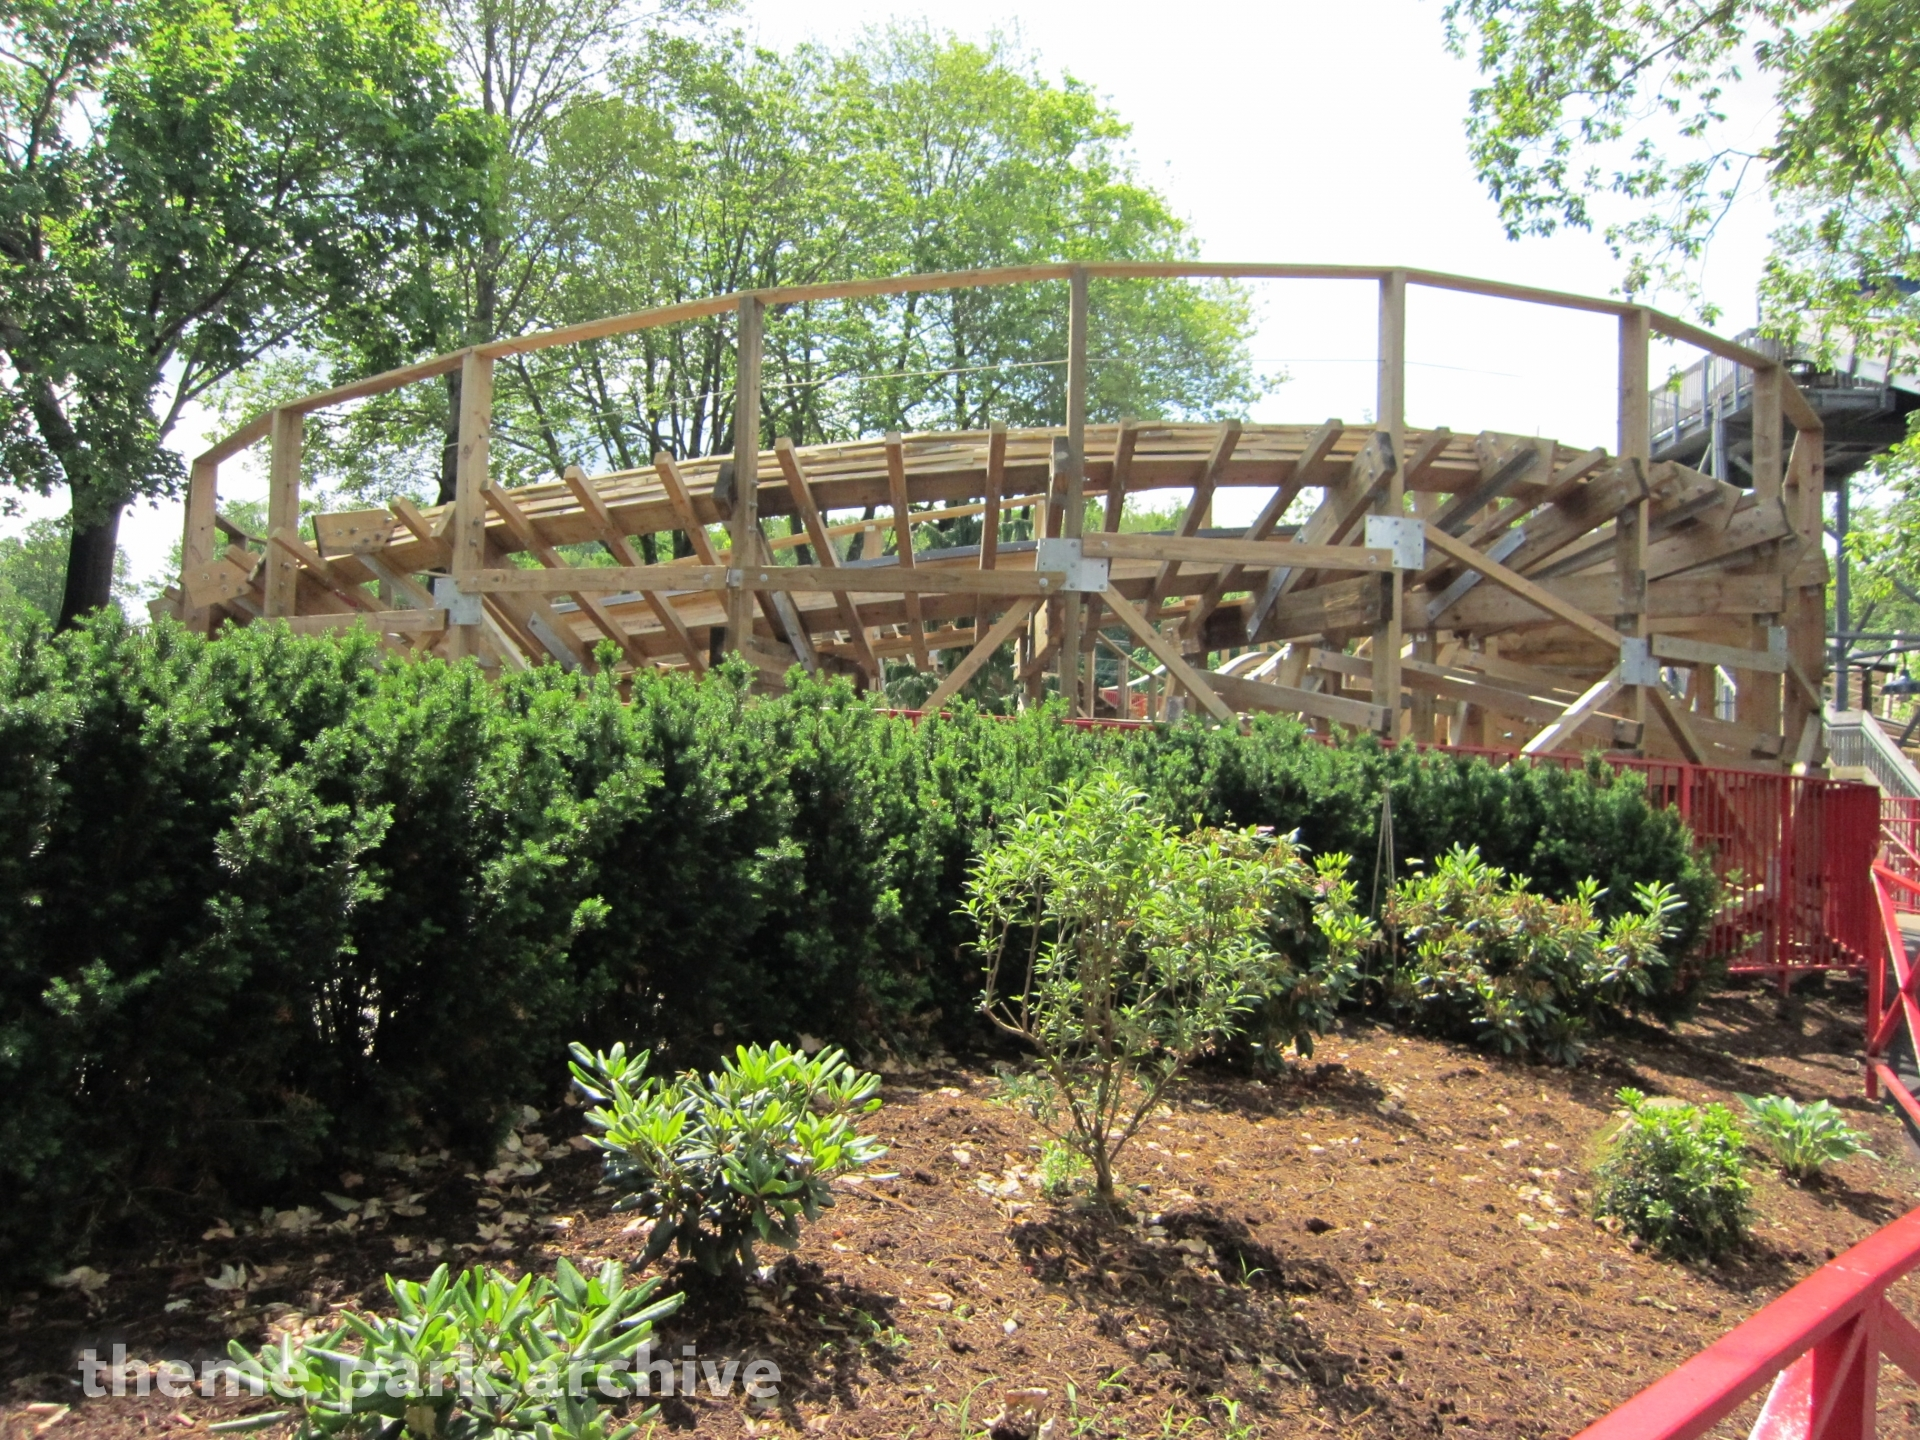 Wooden Warrior at Quassy Amusement Park